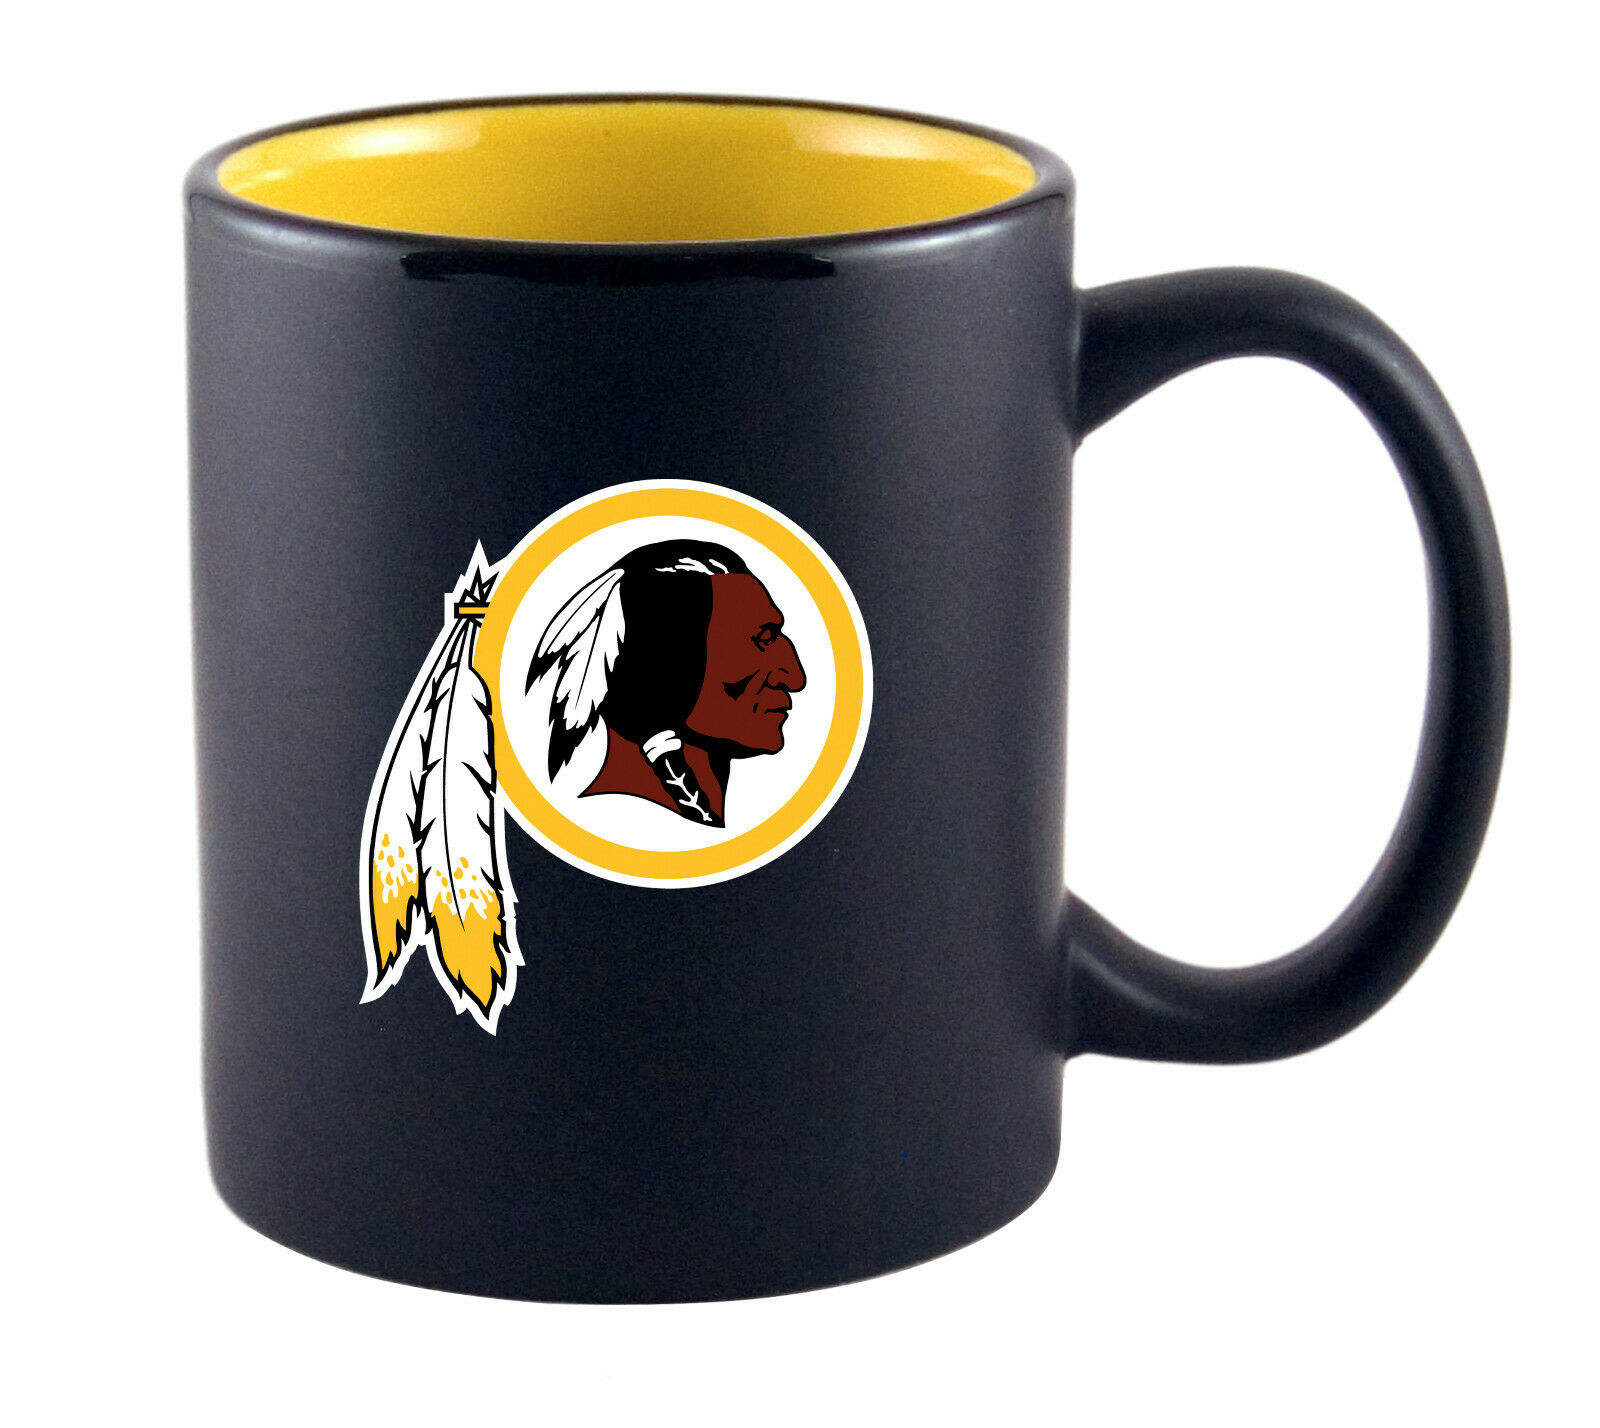 NFL Kaffeetasse Washington Redskins Two Tone Becher Tasse Coffee Mug Football